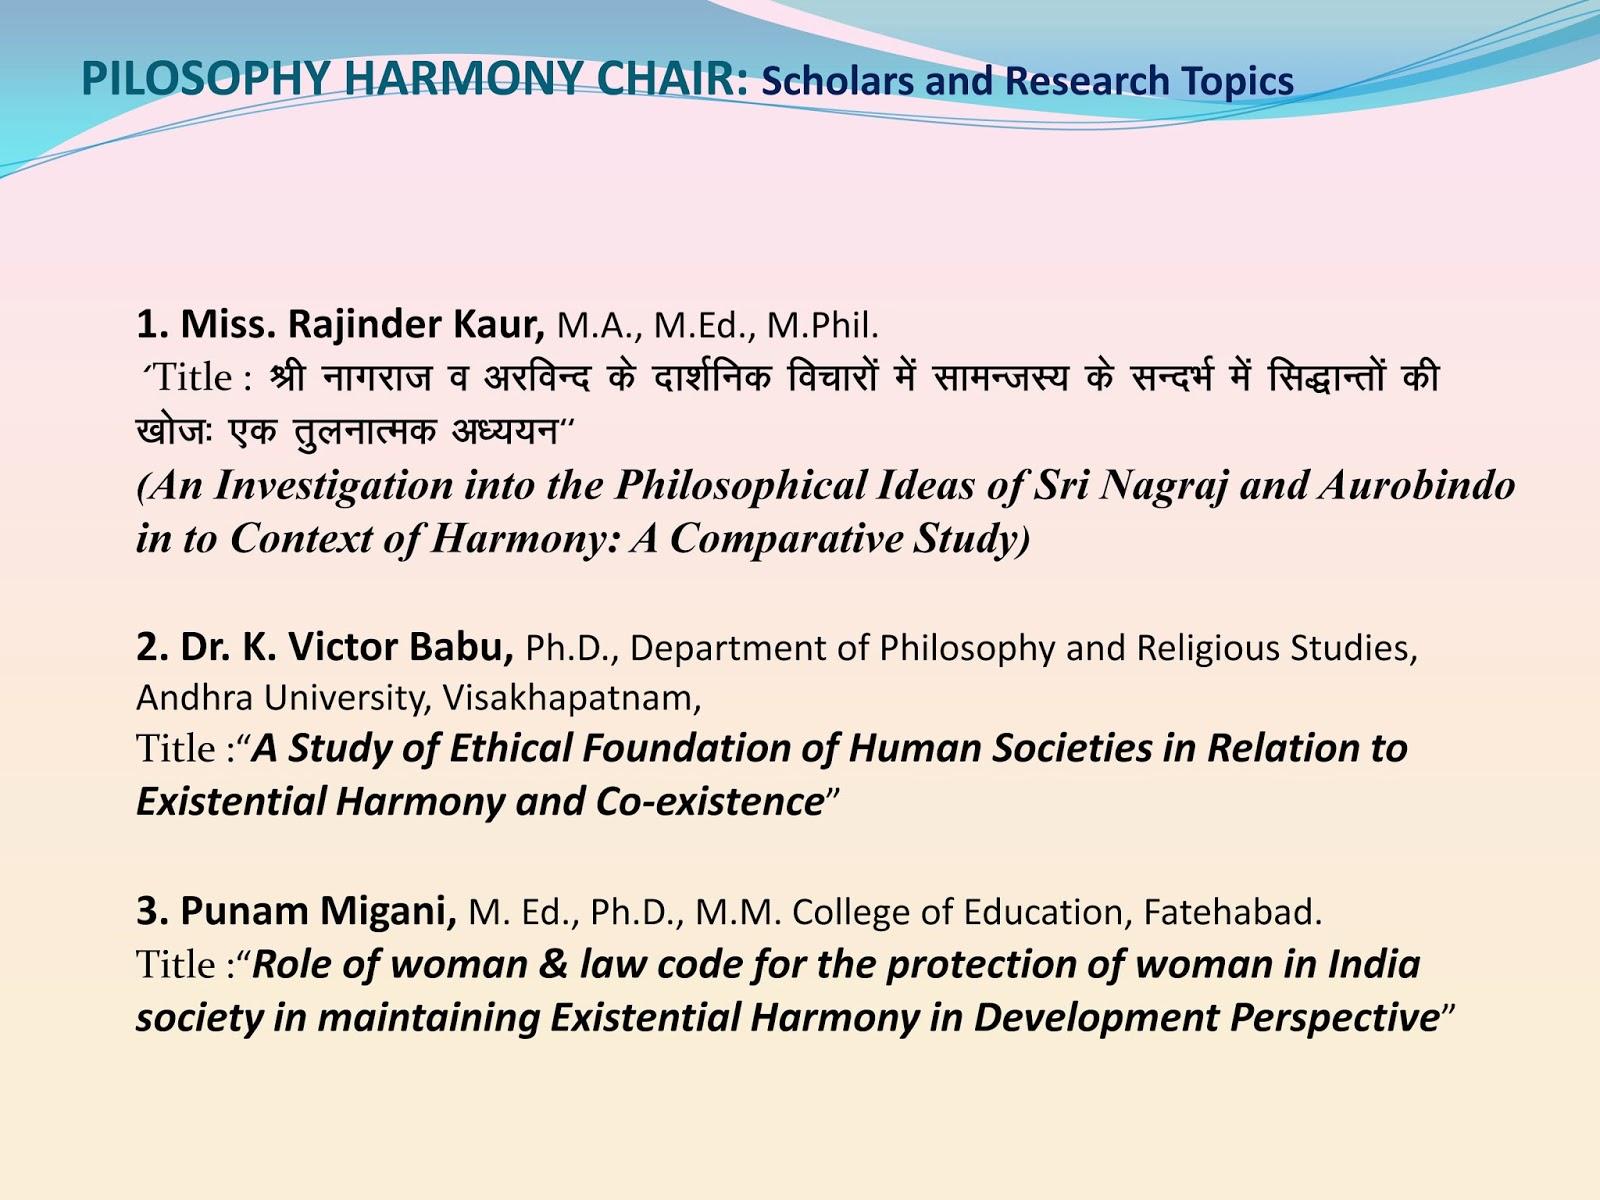 philosophical chairs topics chair covers wedding sale interdisciplinary studies